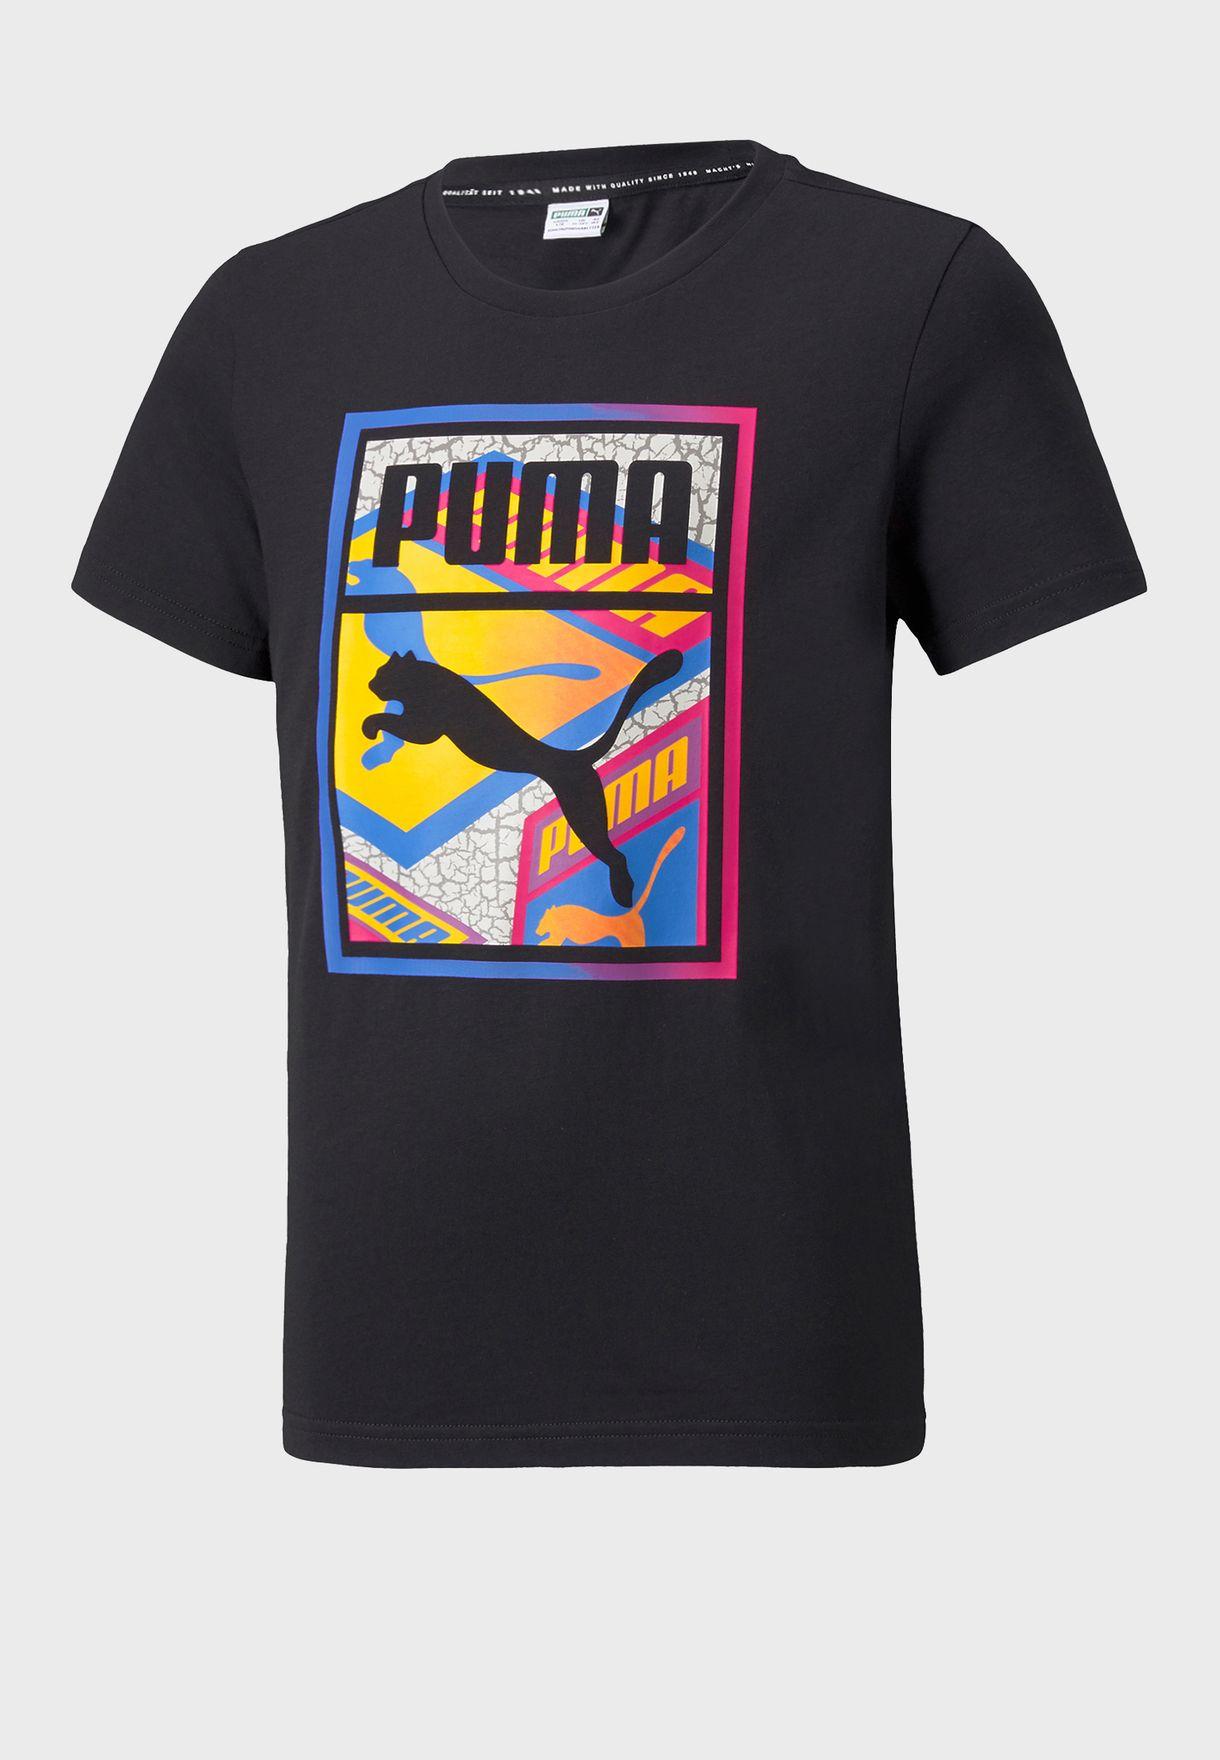 Youth Street Art Graphic T-Shirt